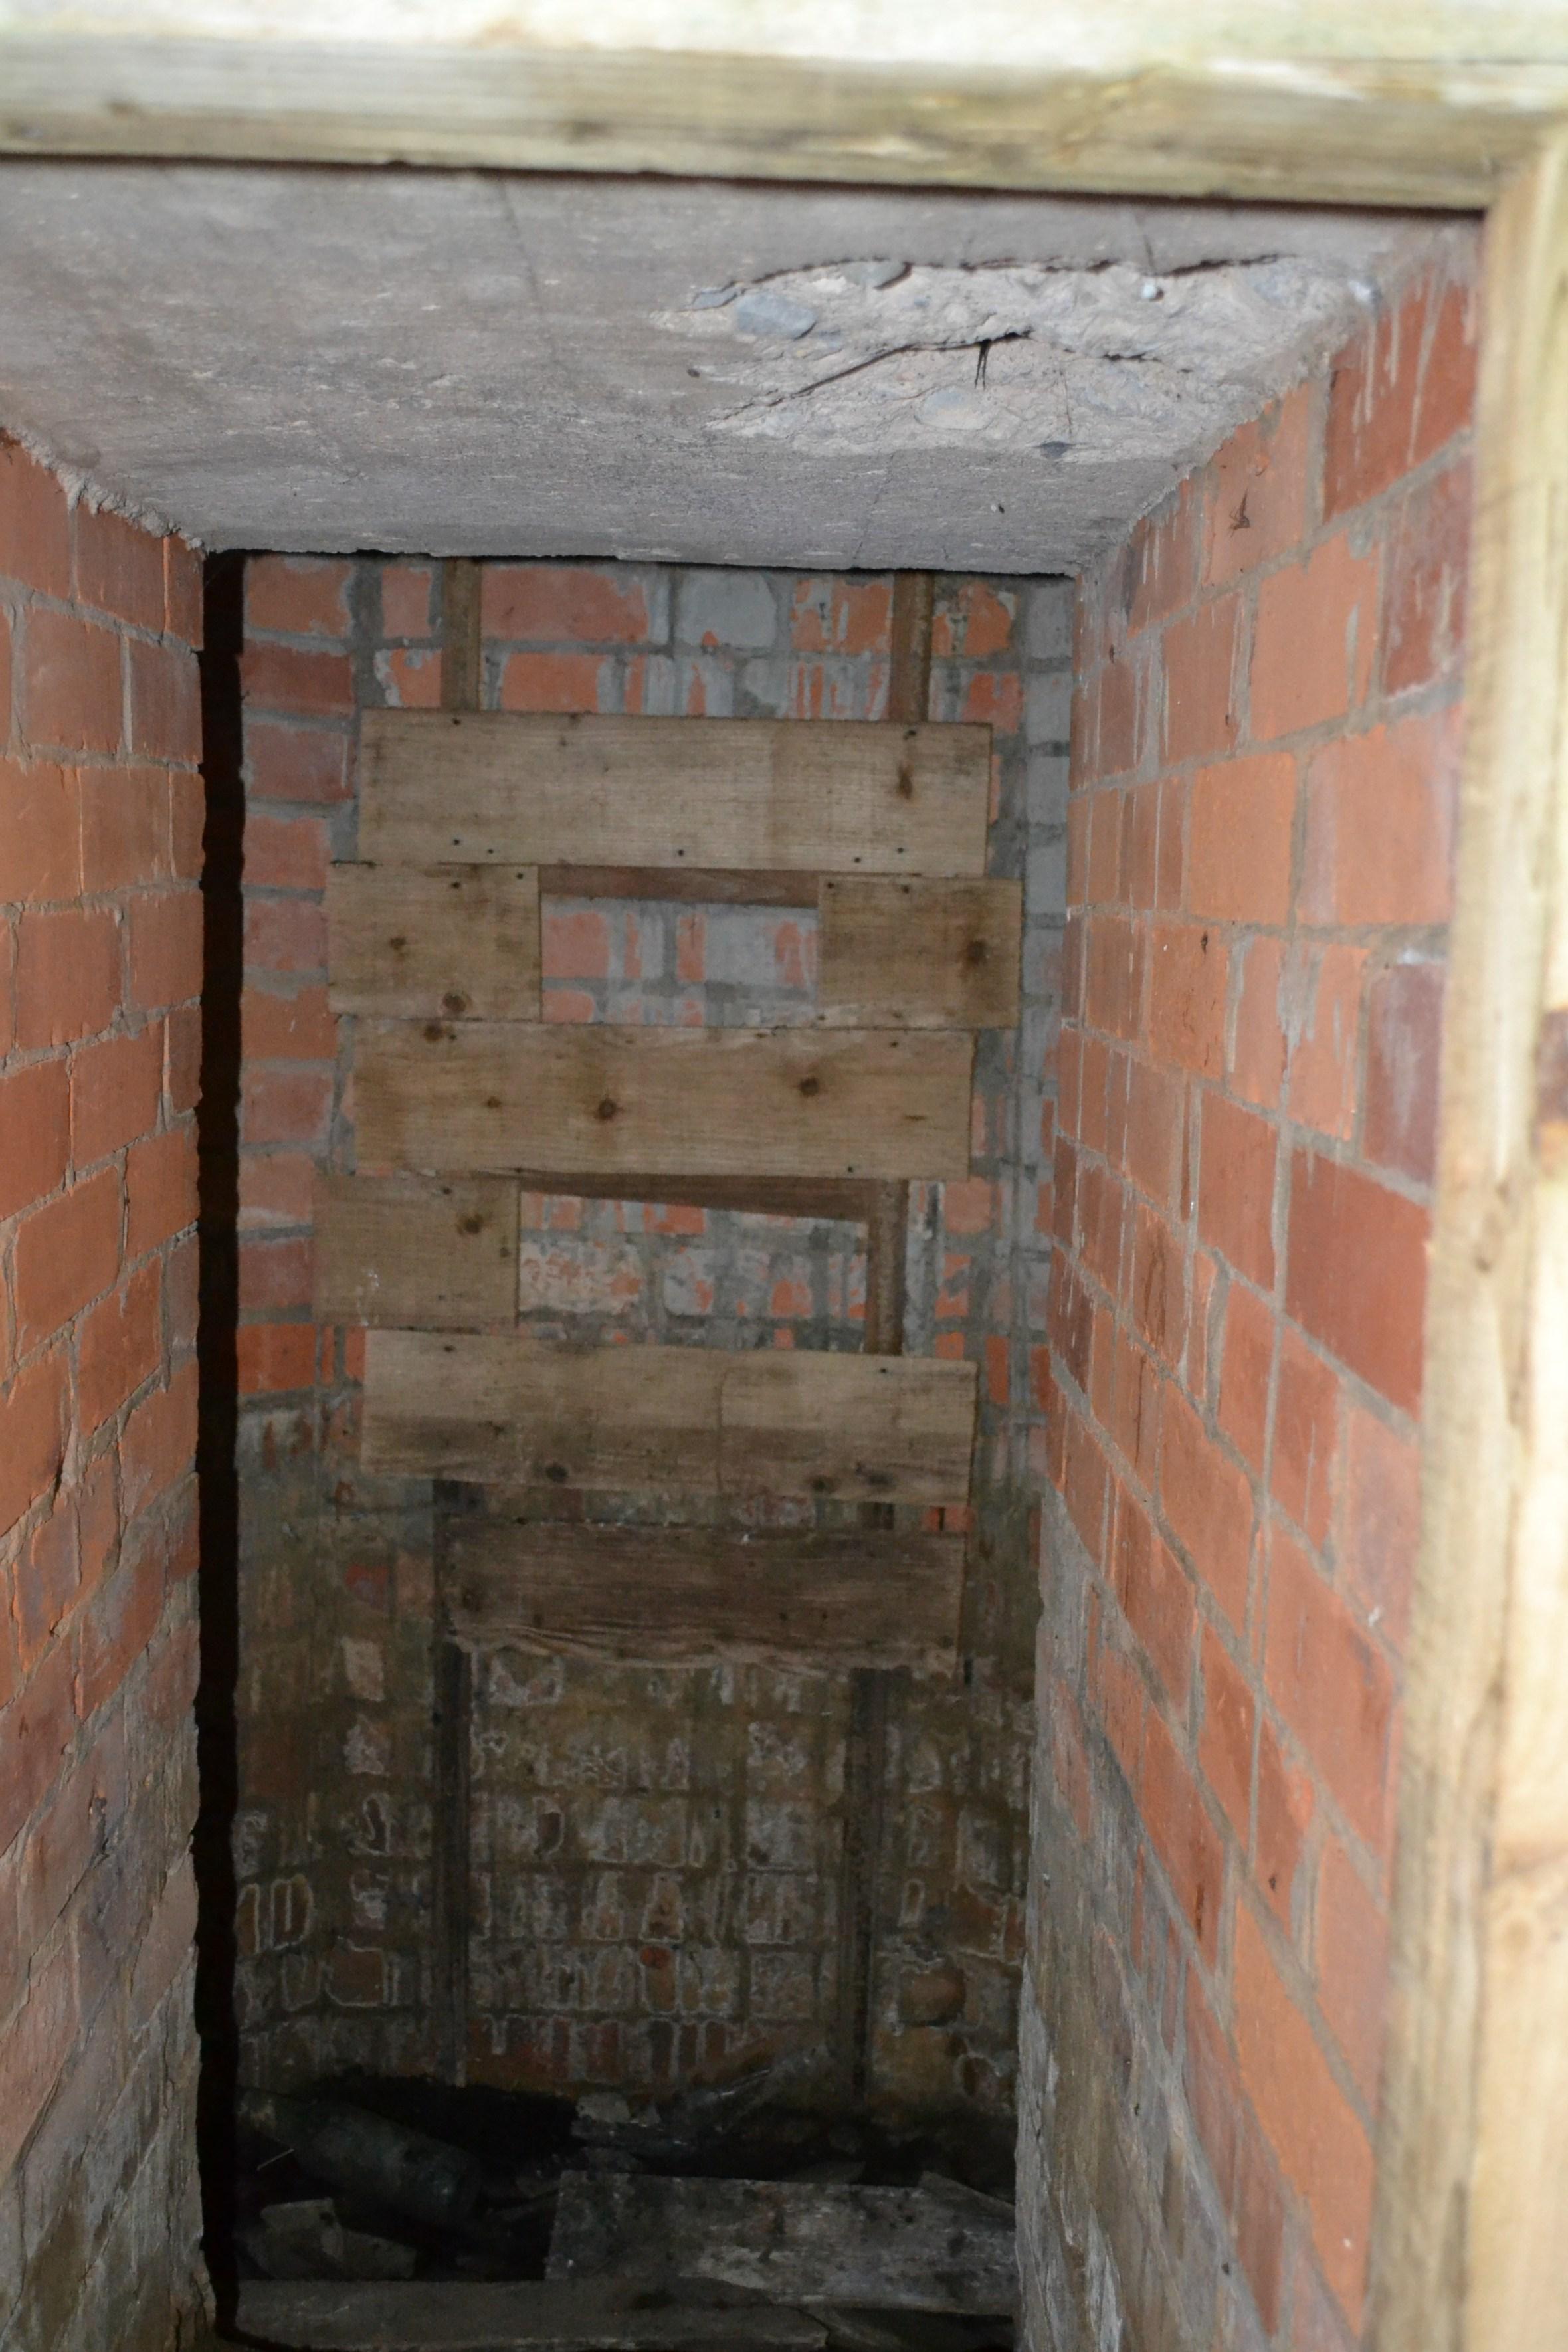 FW3/24 Pillbox entrance